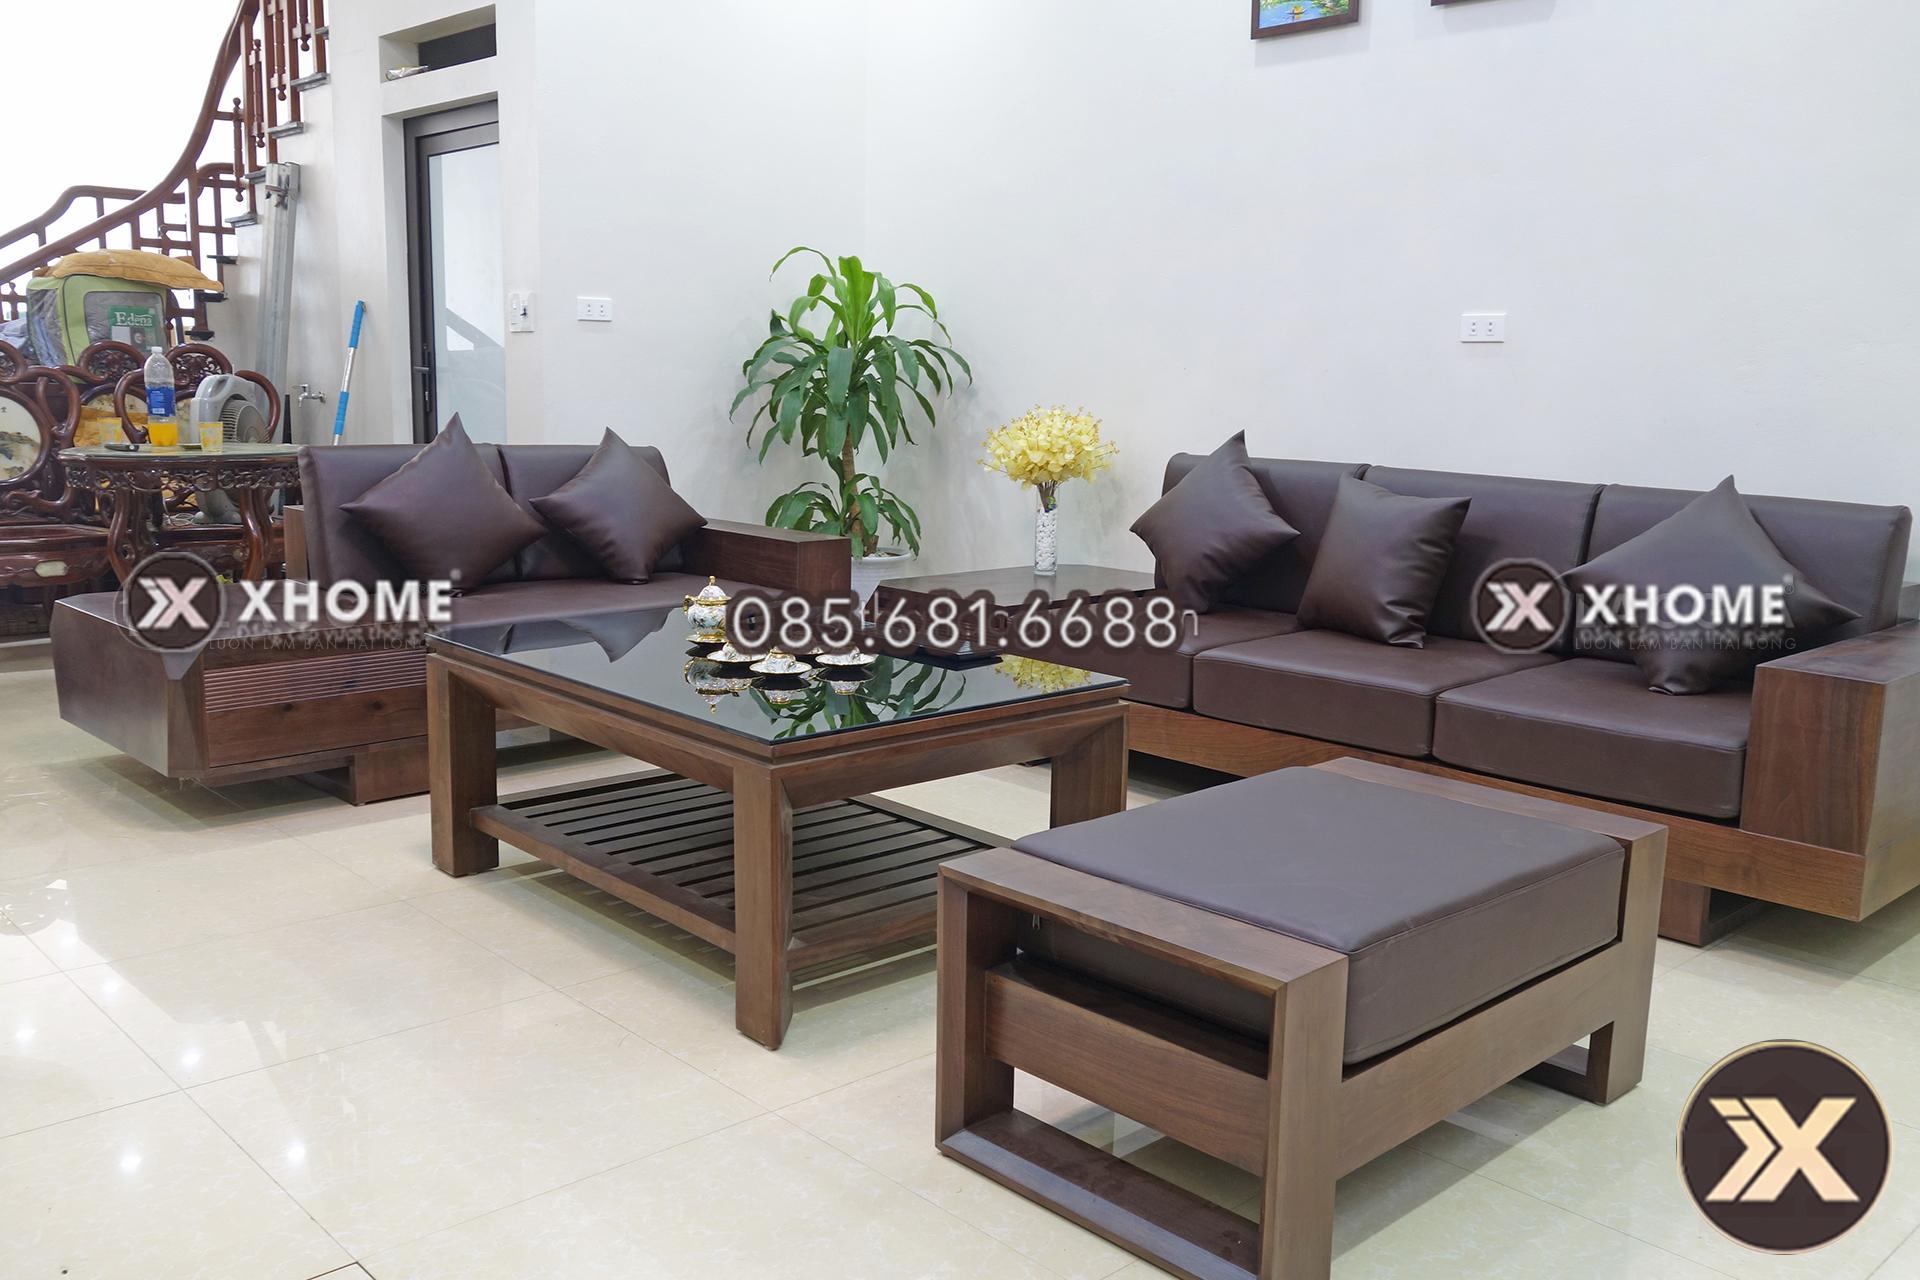 Mẫu sofa gỗ sồi Nga đẹp